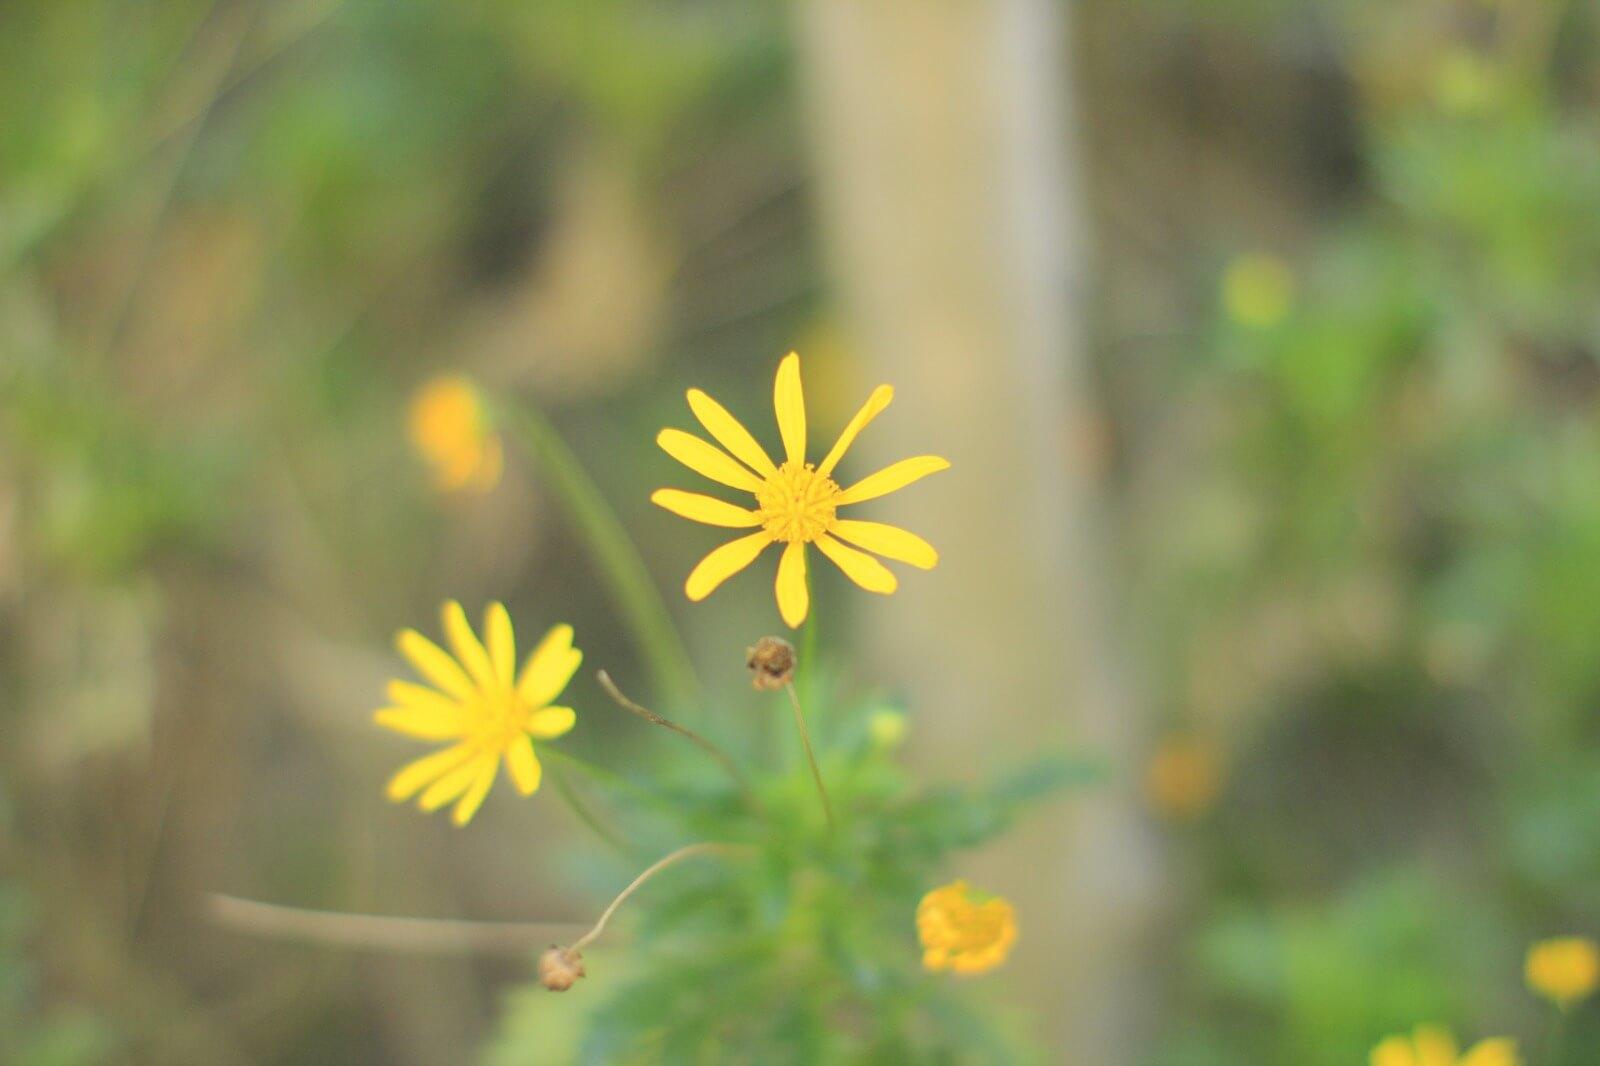 f1.4-yellow